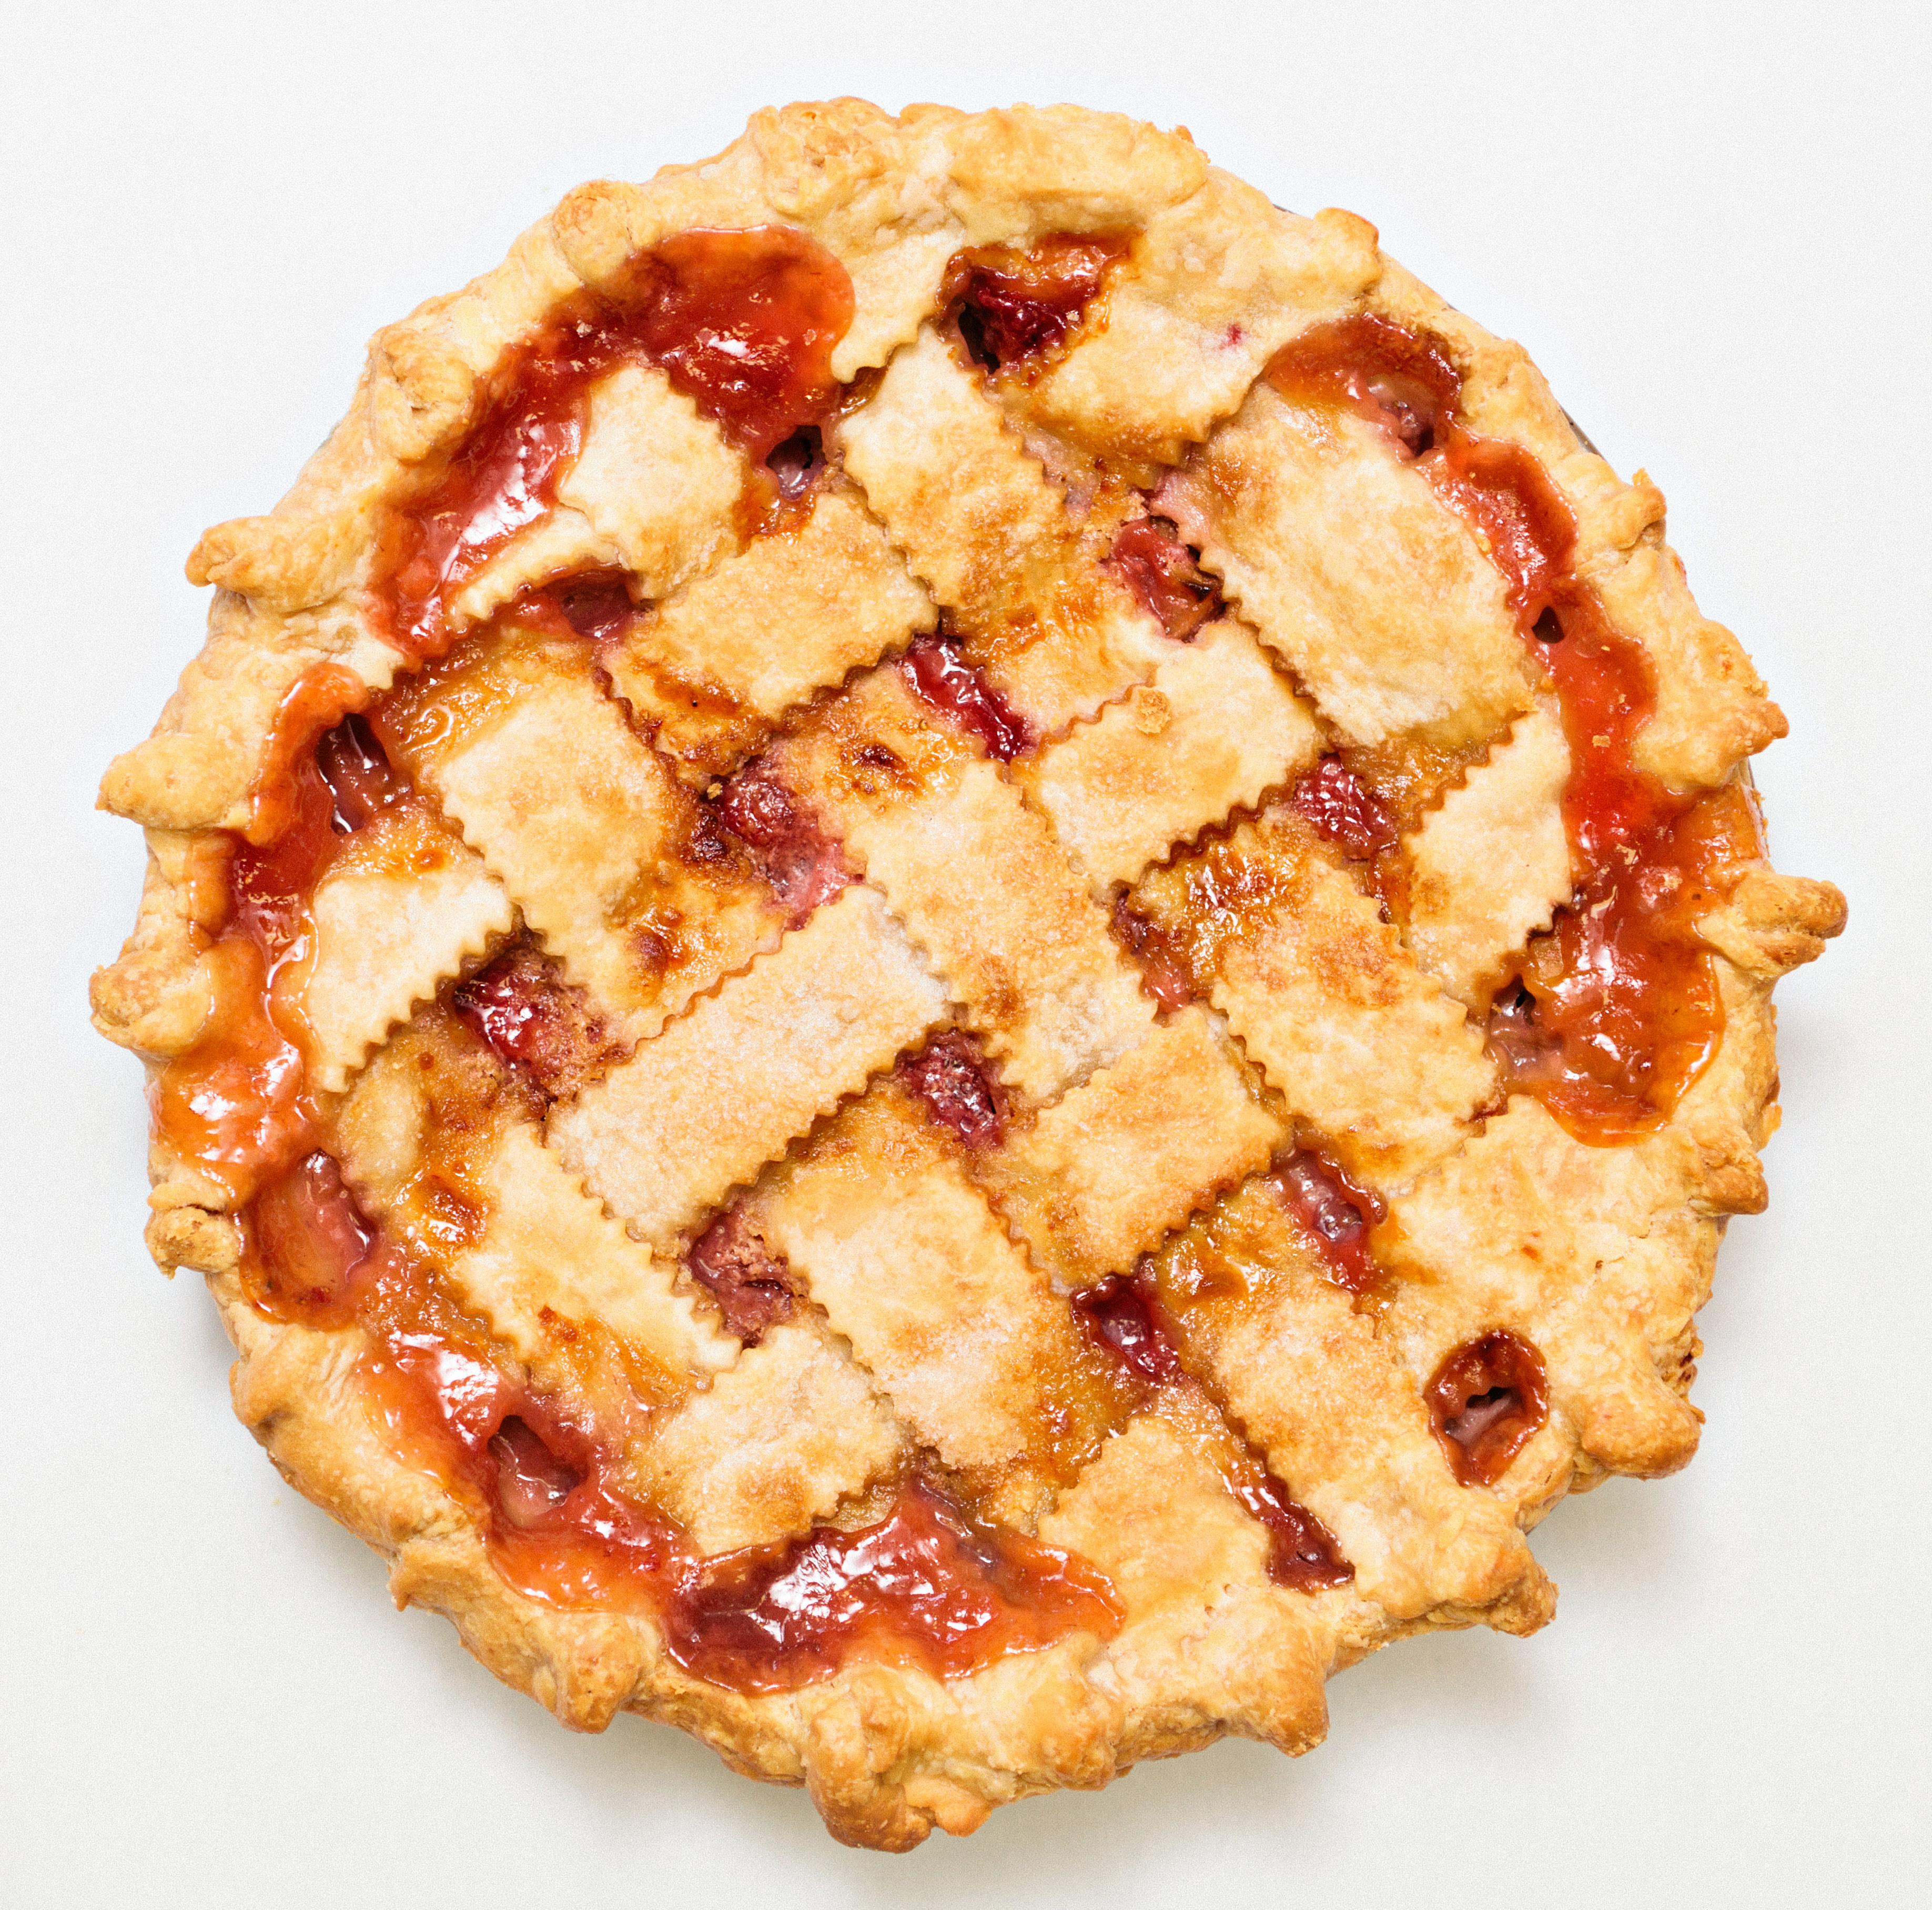 Home / Shop / Pies / Fruit Pies / Rhubarb Pie (Lattice Crust)